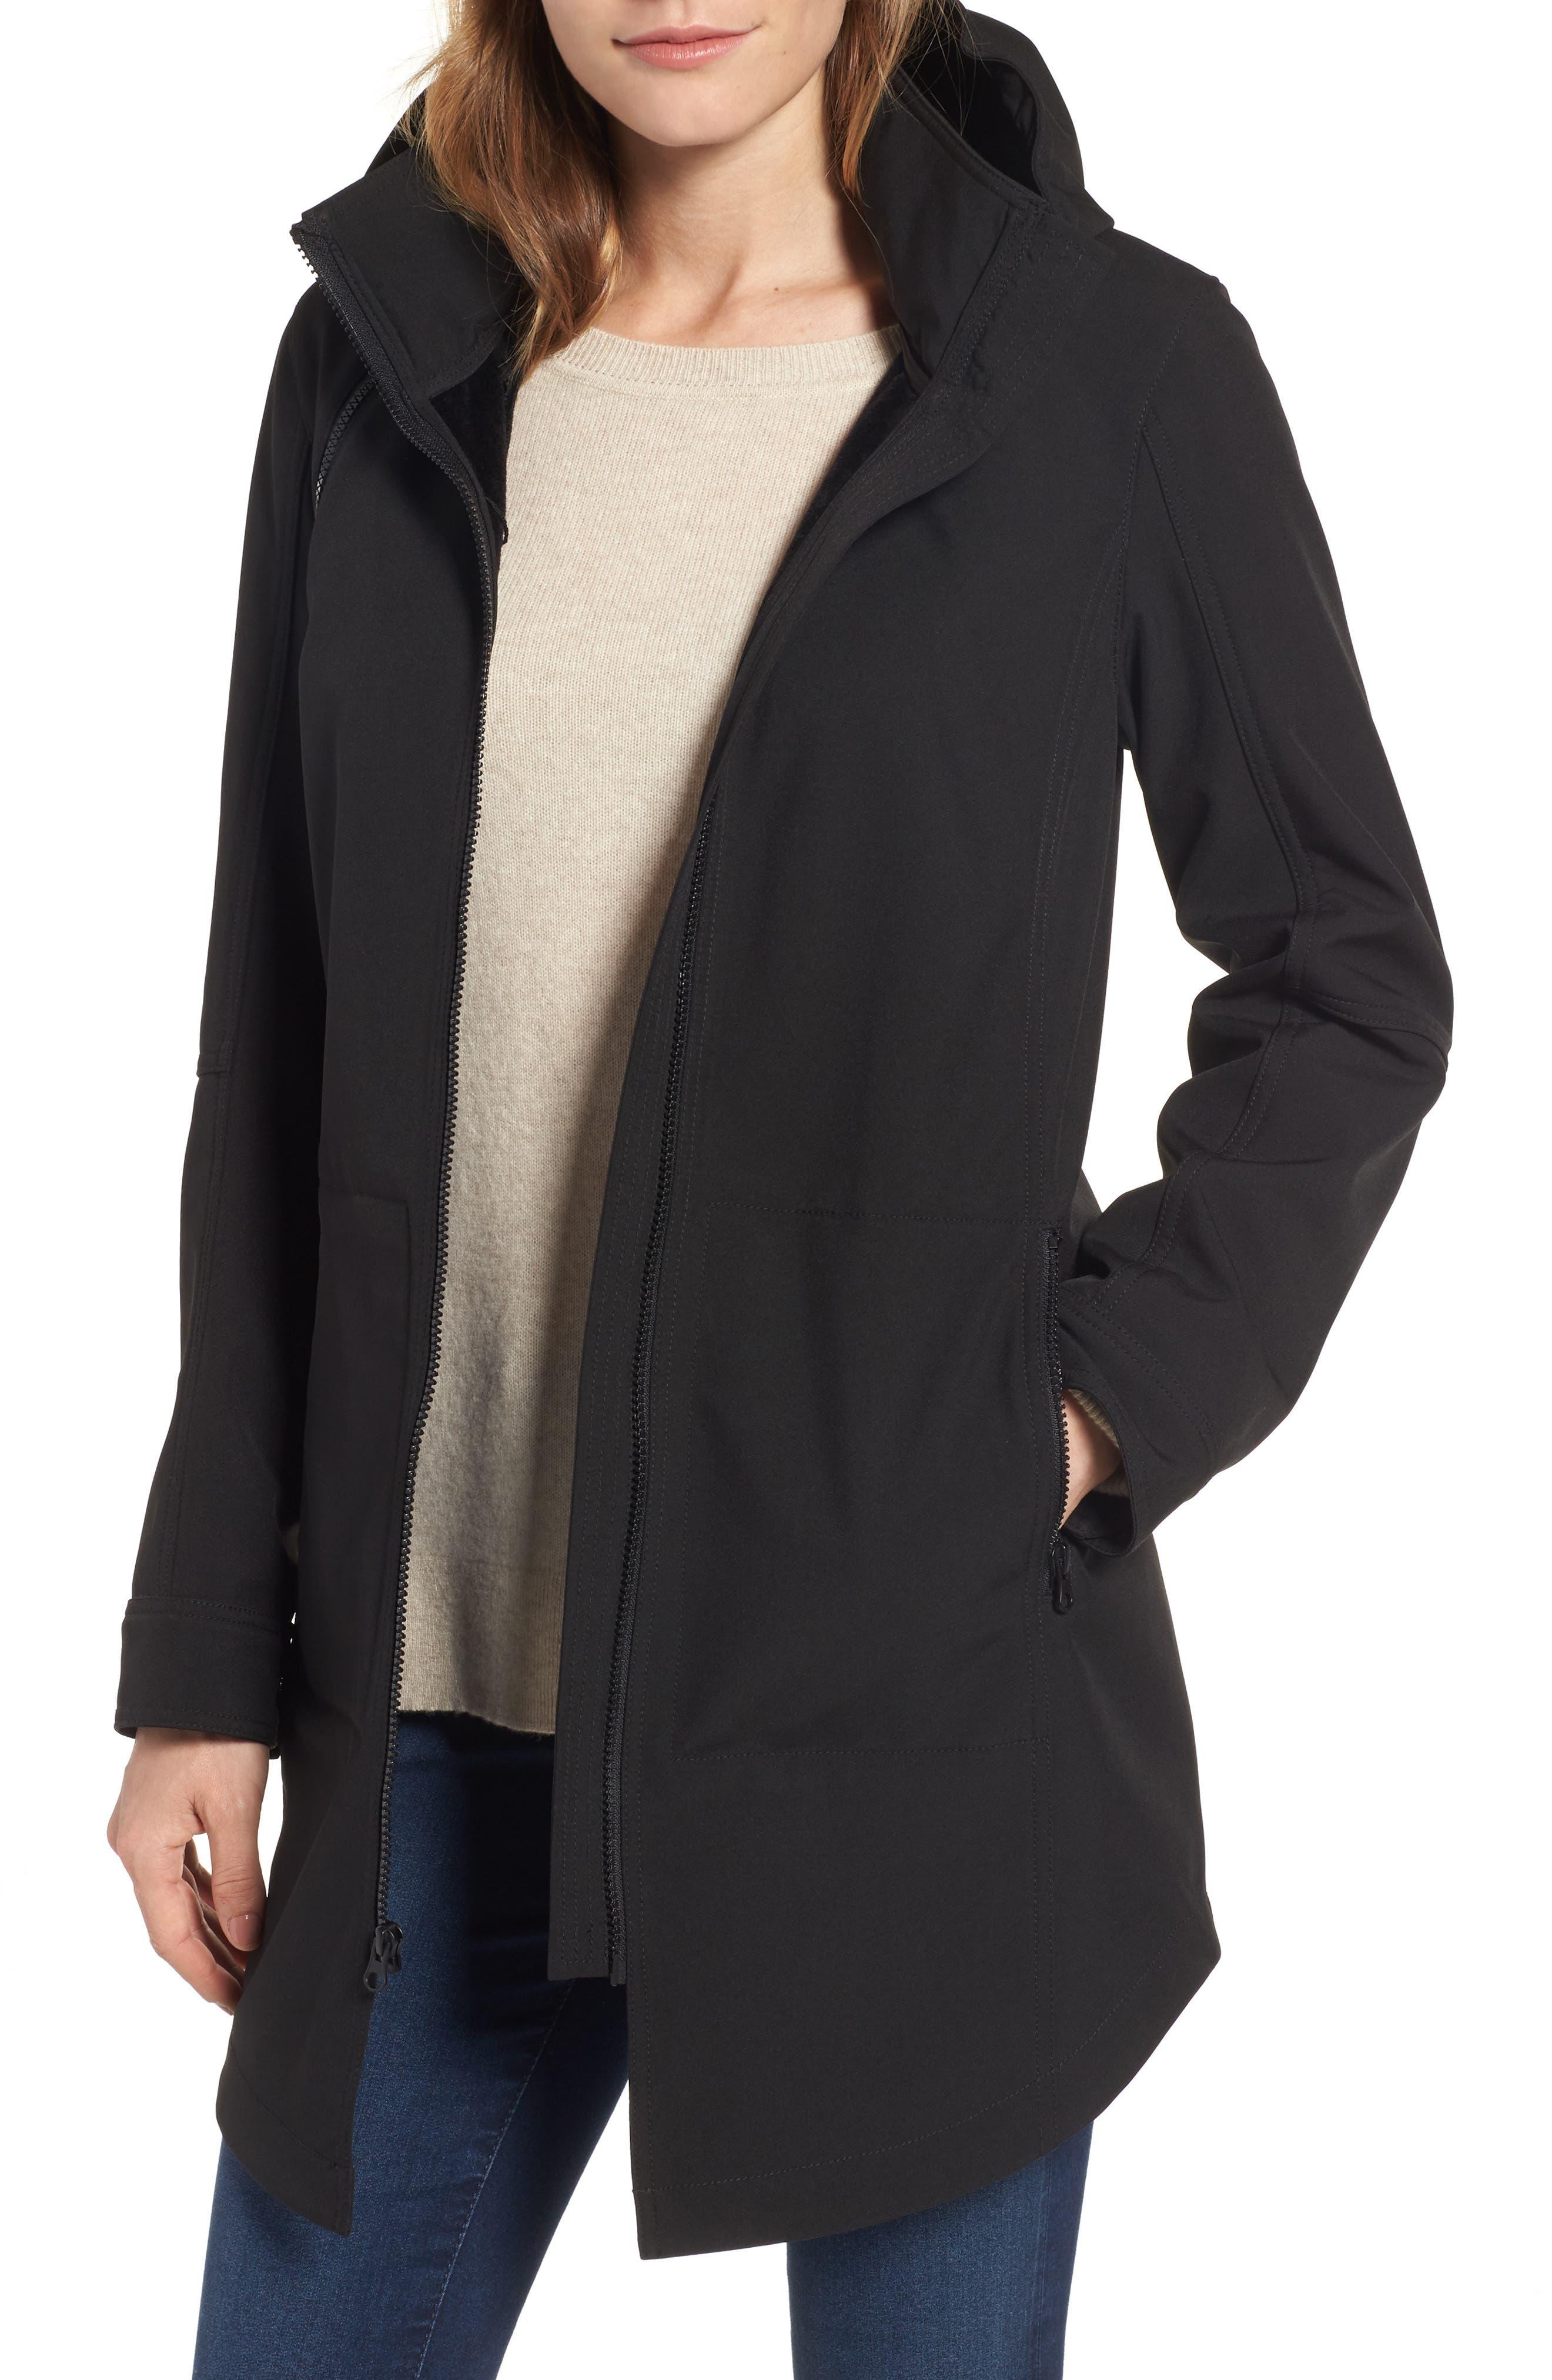 Kristen Blake Stand Collar Raincoat with Detachable Hood (Regular & Petite)